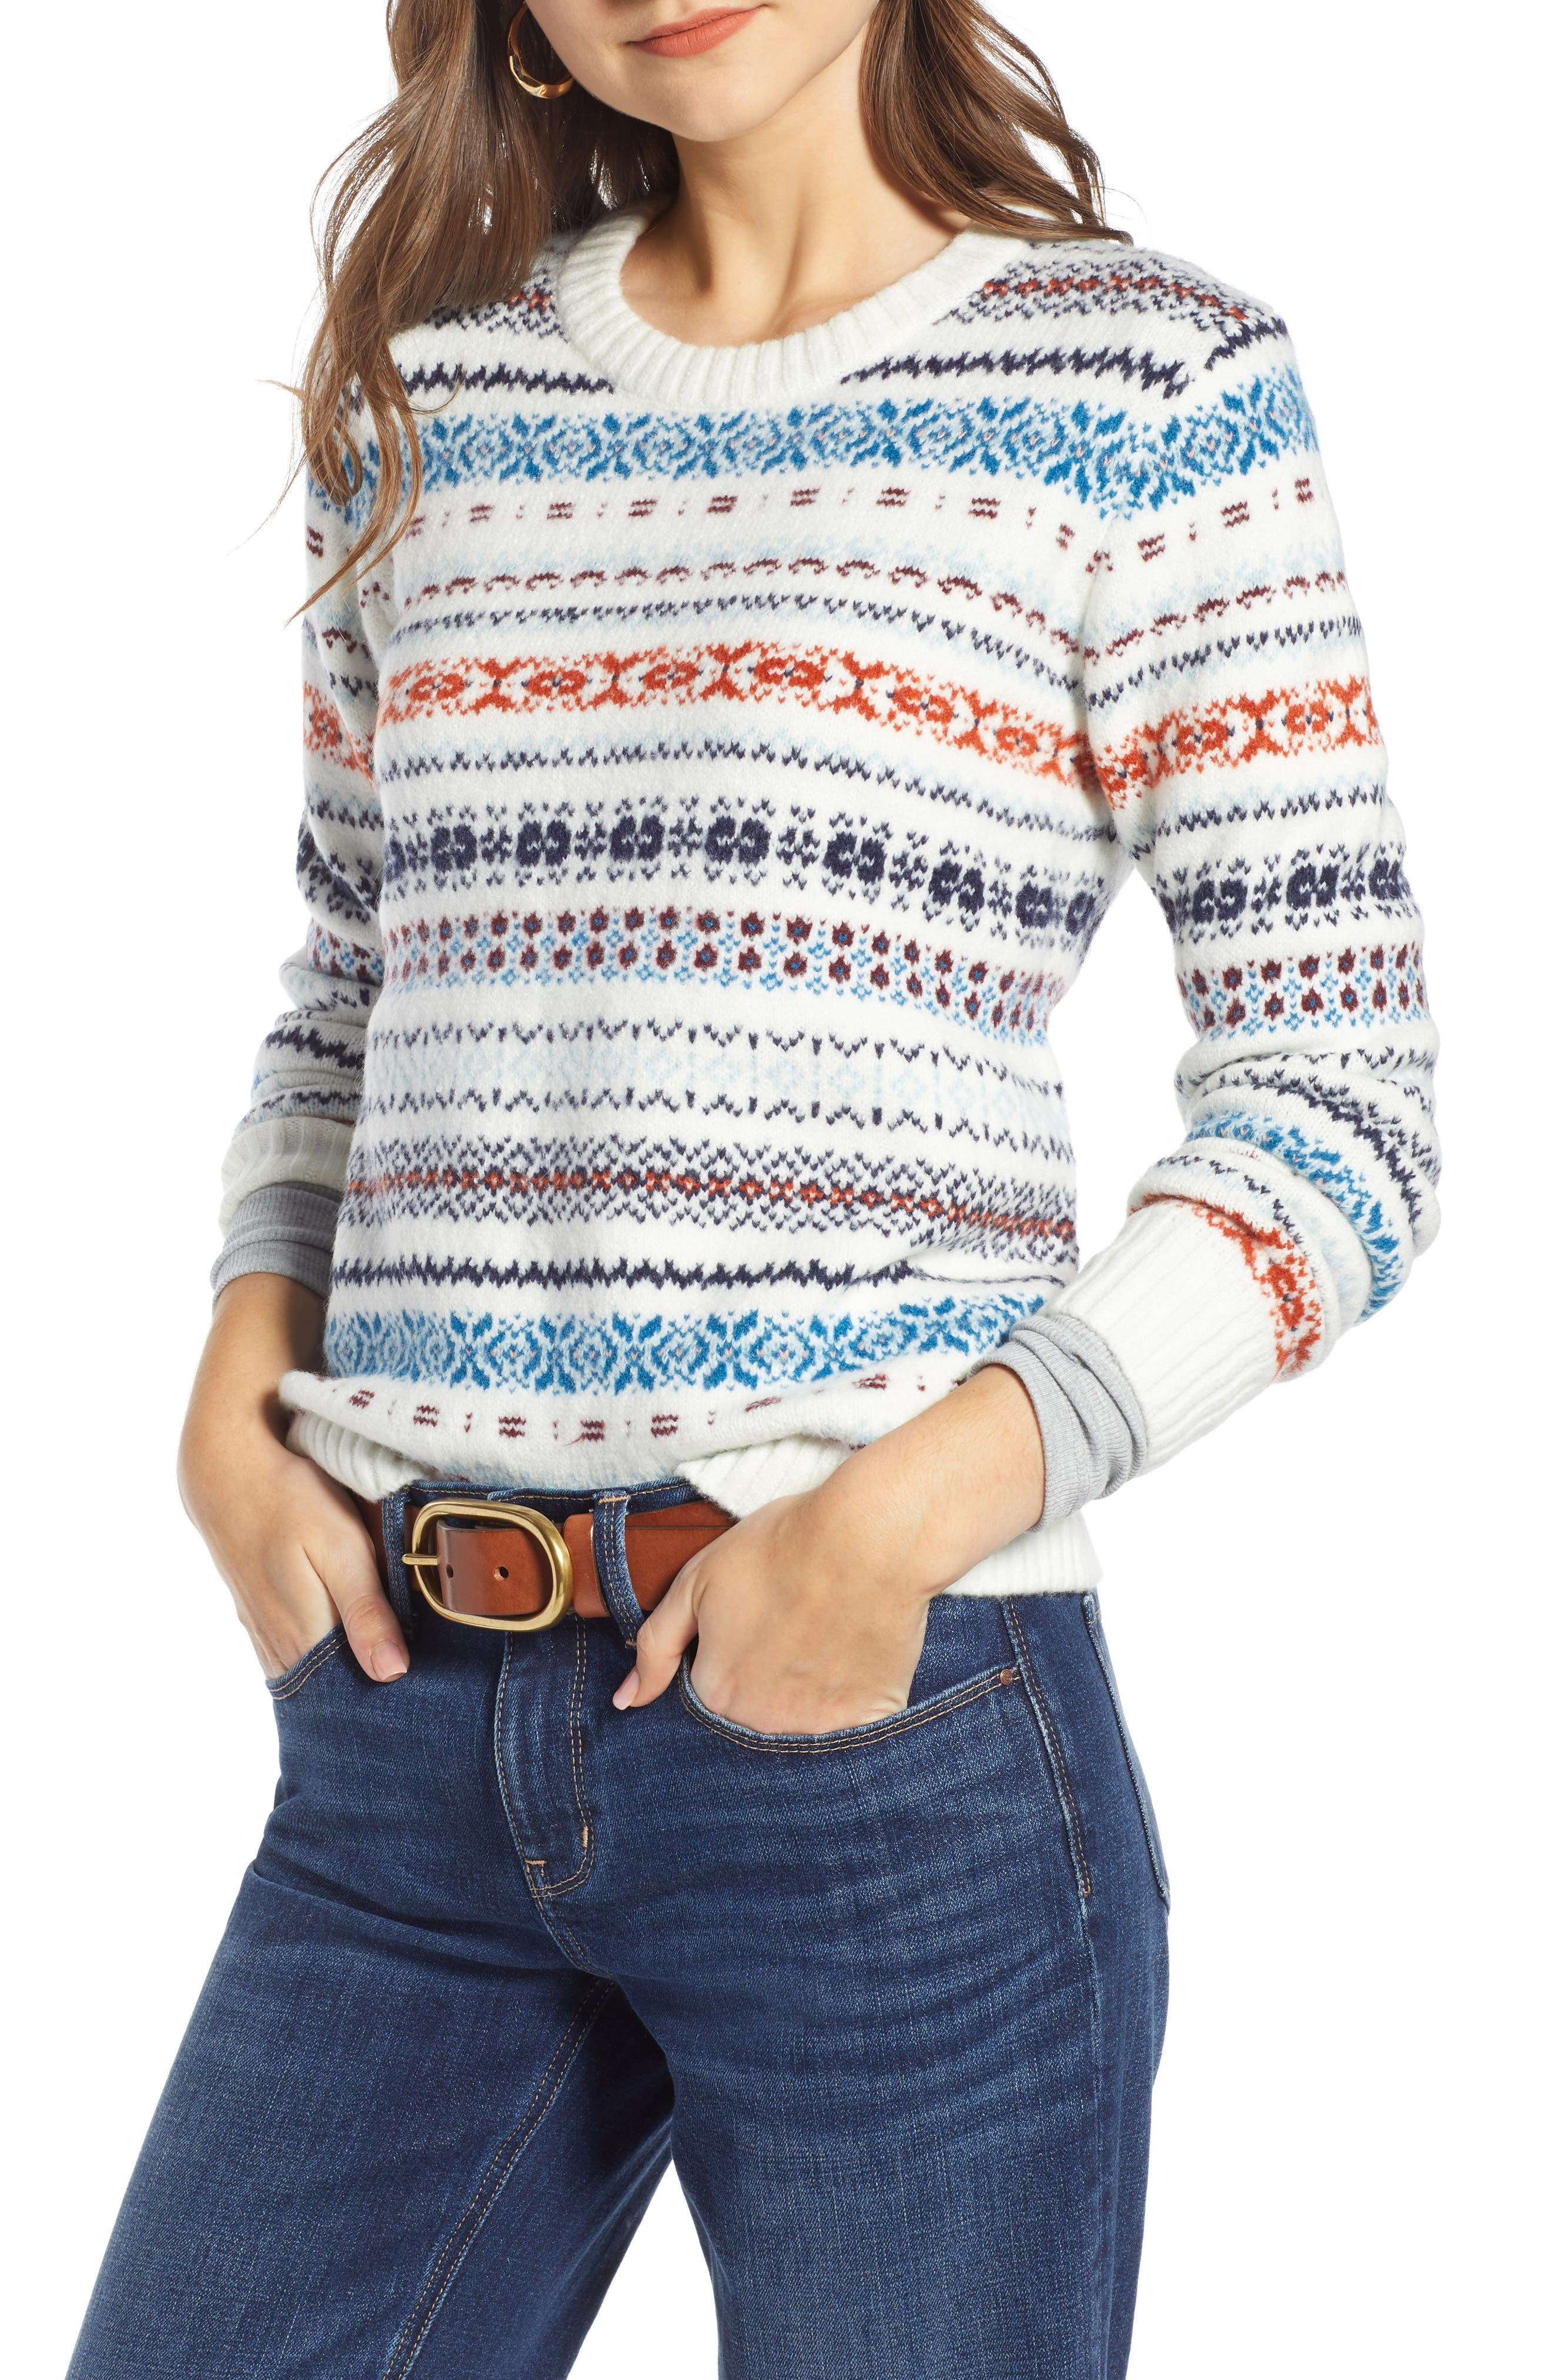 TREASURE & BOND Fair Isle Sweater, Main, color, 900